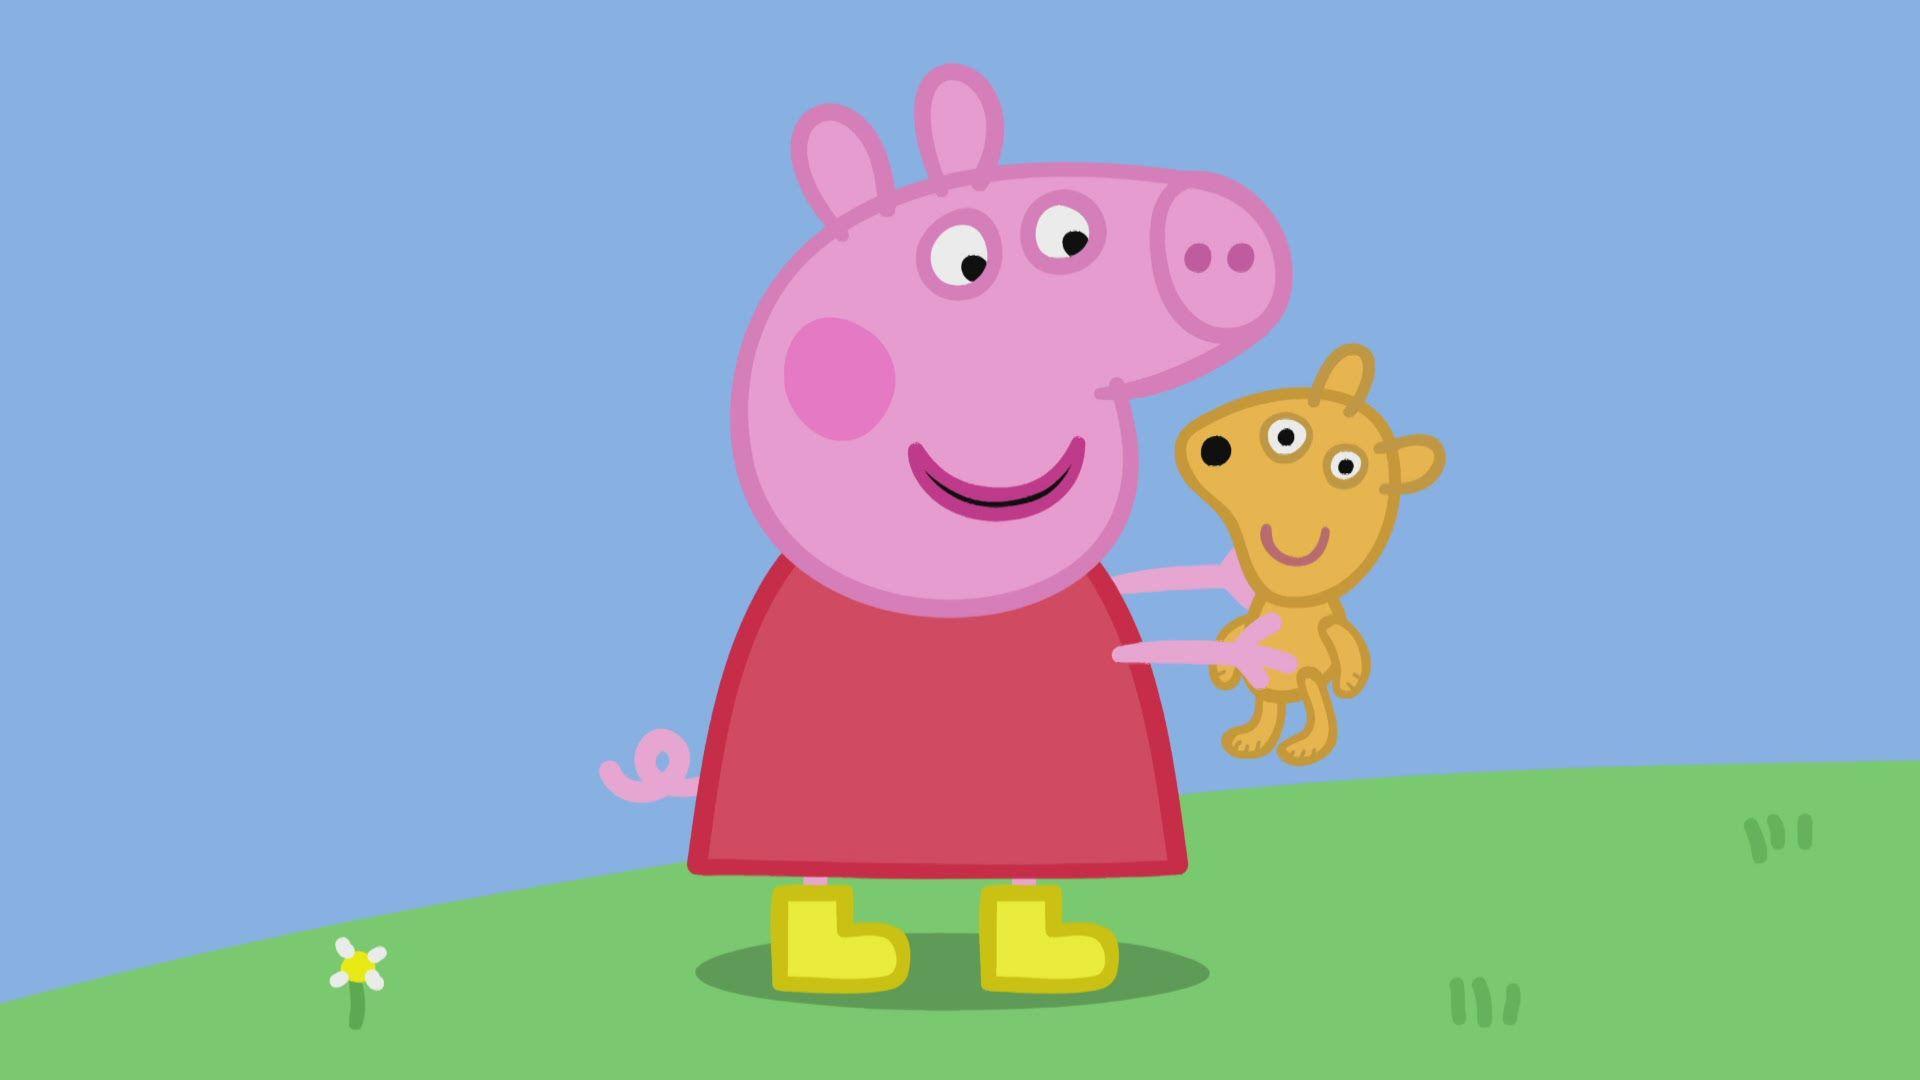 Peppa Pig desktop wallpaper download